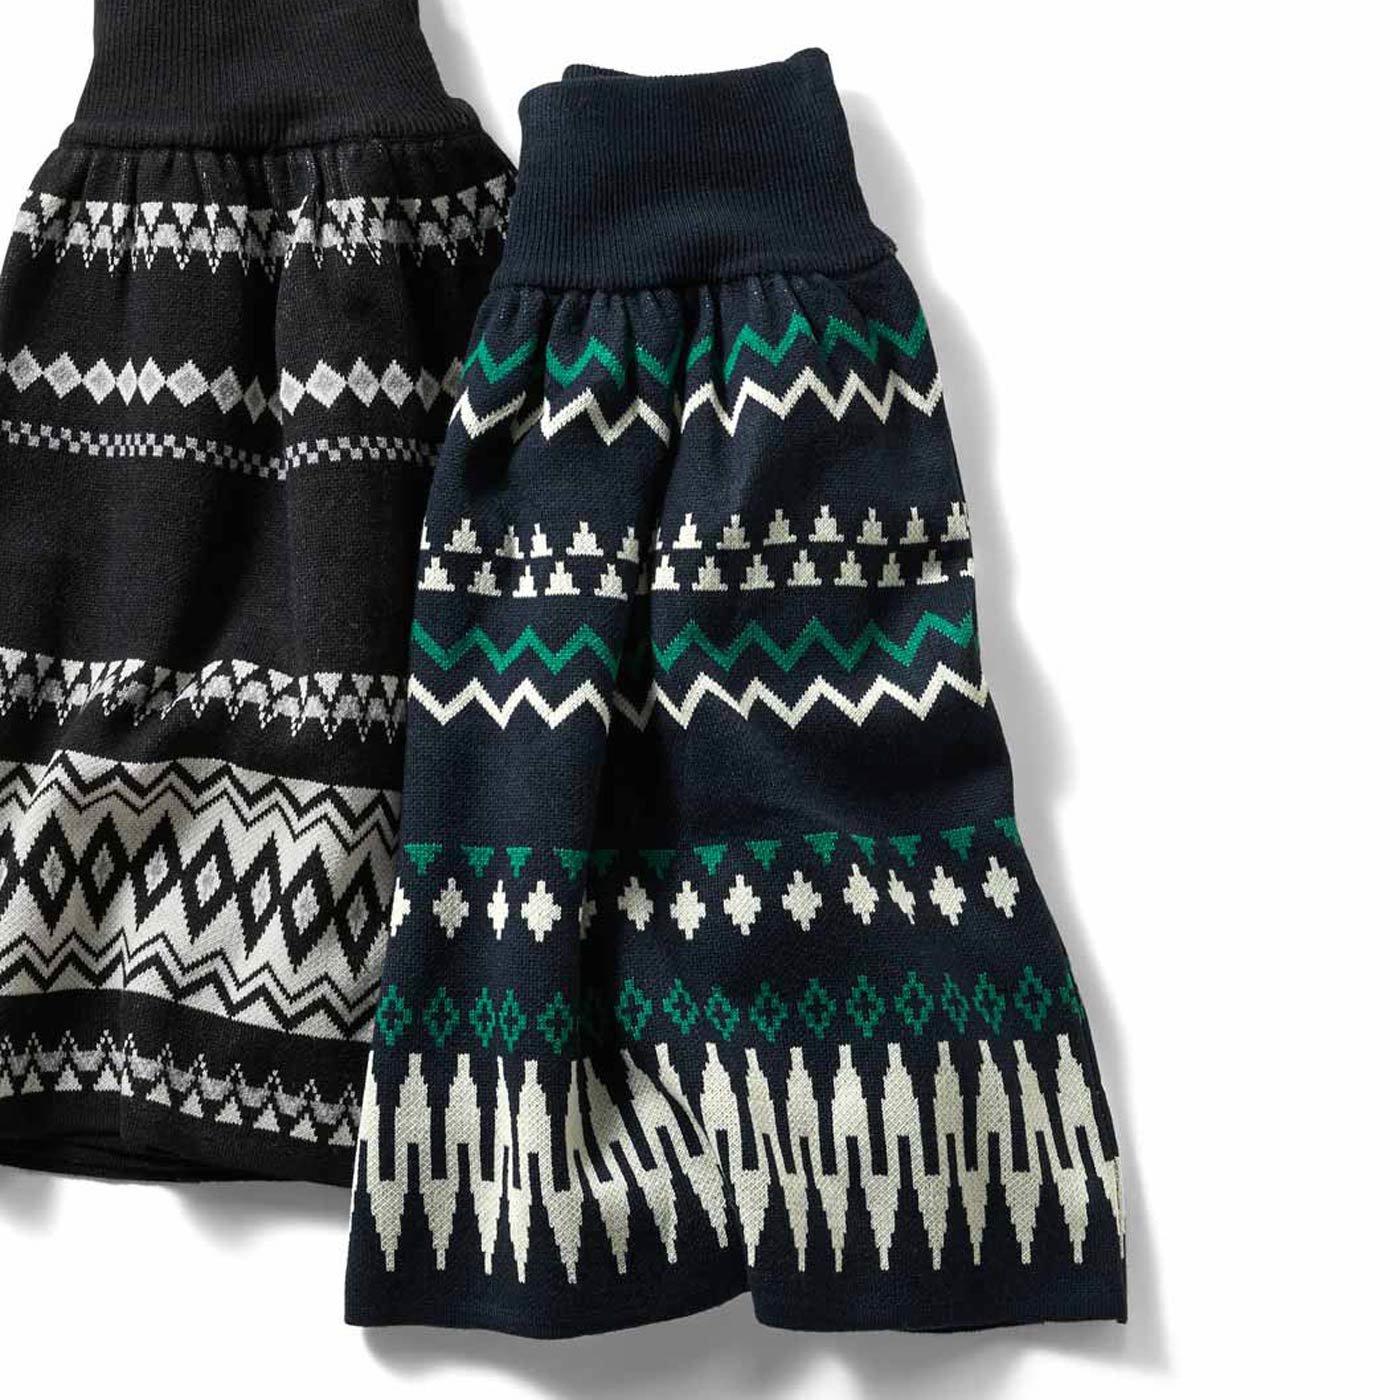 IEDIT[イディット] ジャカード柄のウエストリブニットスカート〈ネイビー〉